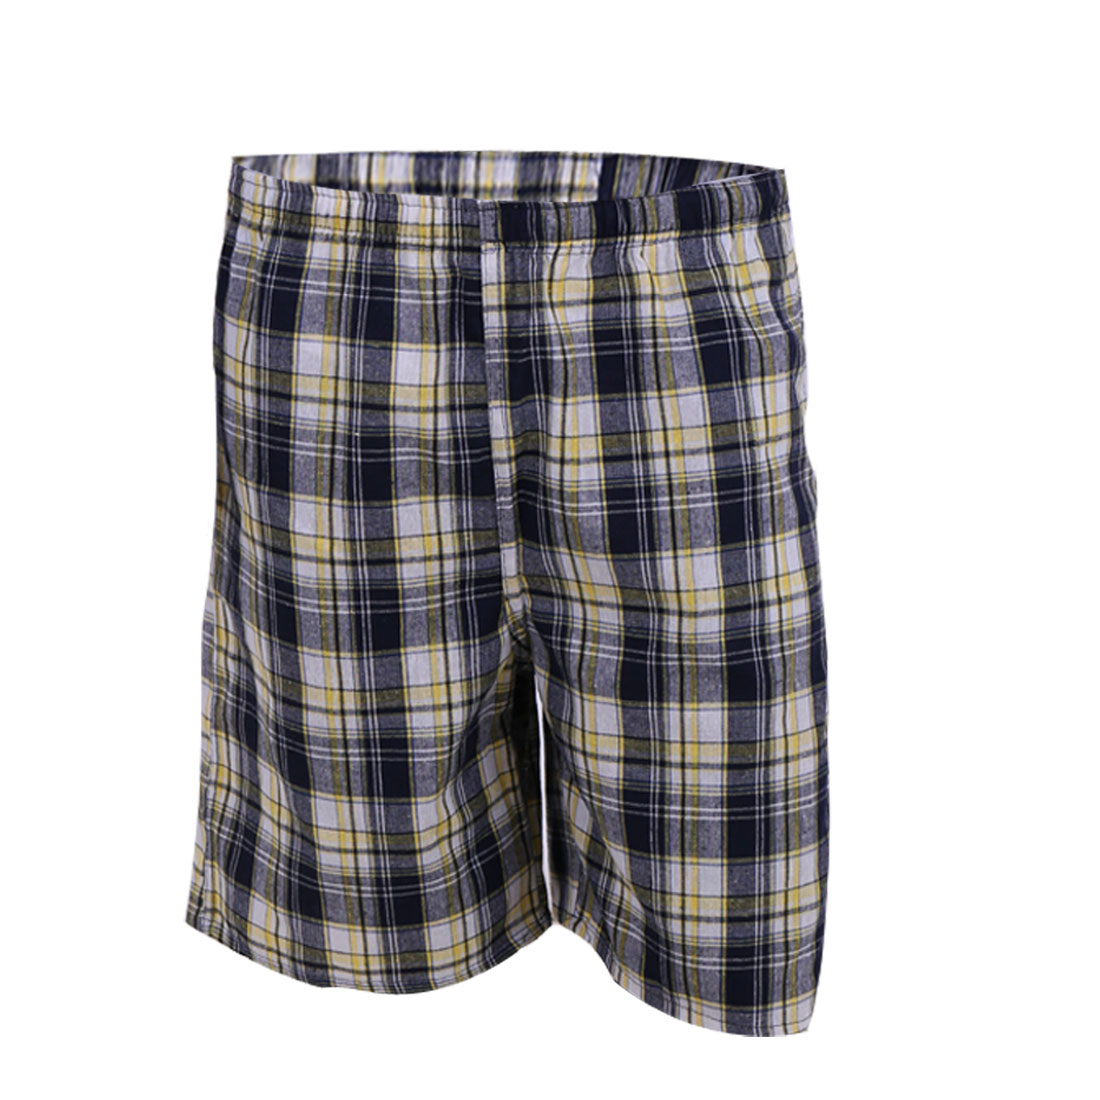 Men Drawstring Front Pocket Stretchy Waist Back Pocket Shorts W29 Yellow